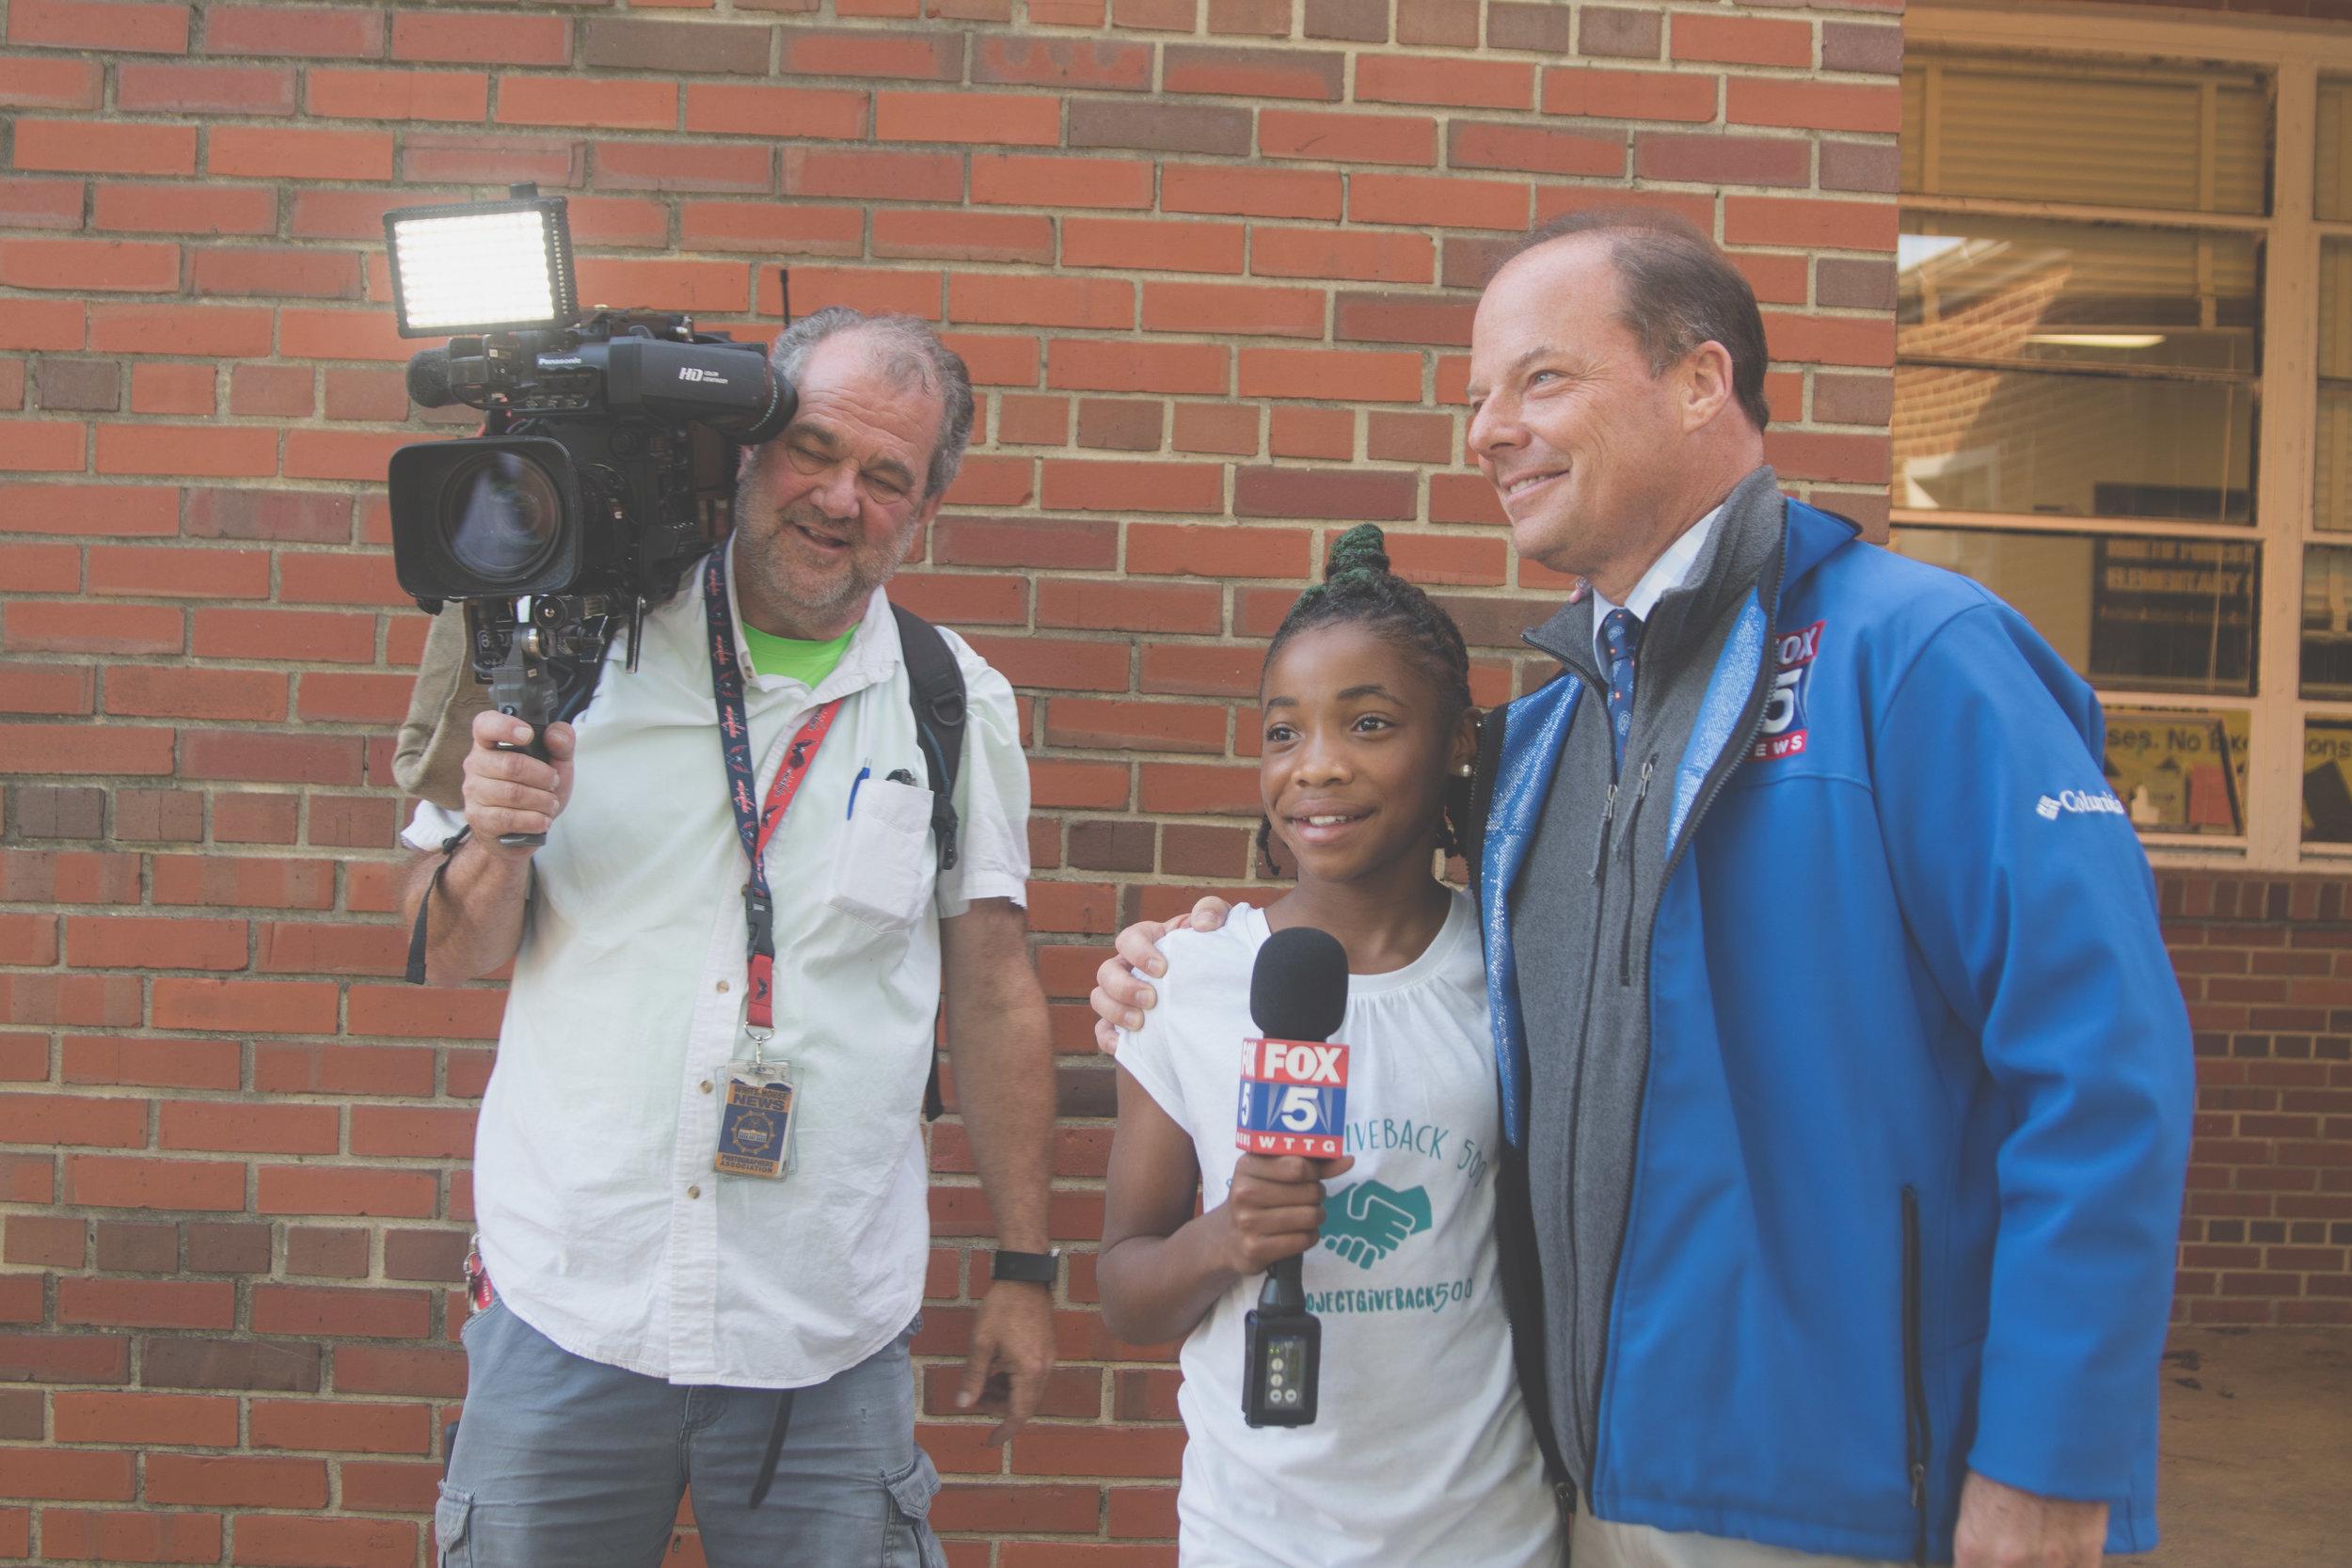 DaShai Morton interviews with local Fox 5 news station.